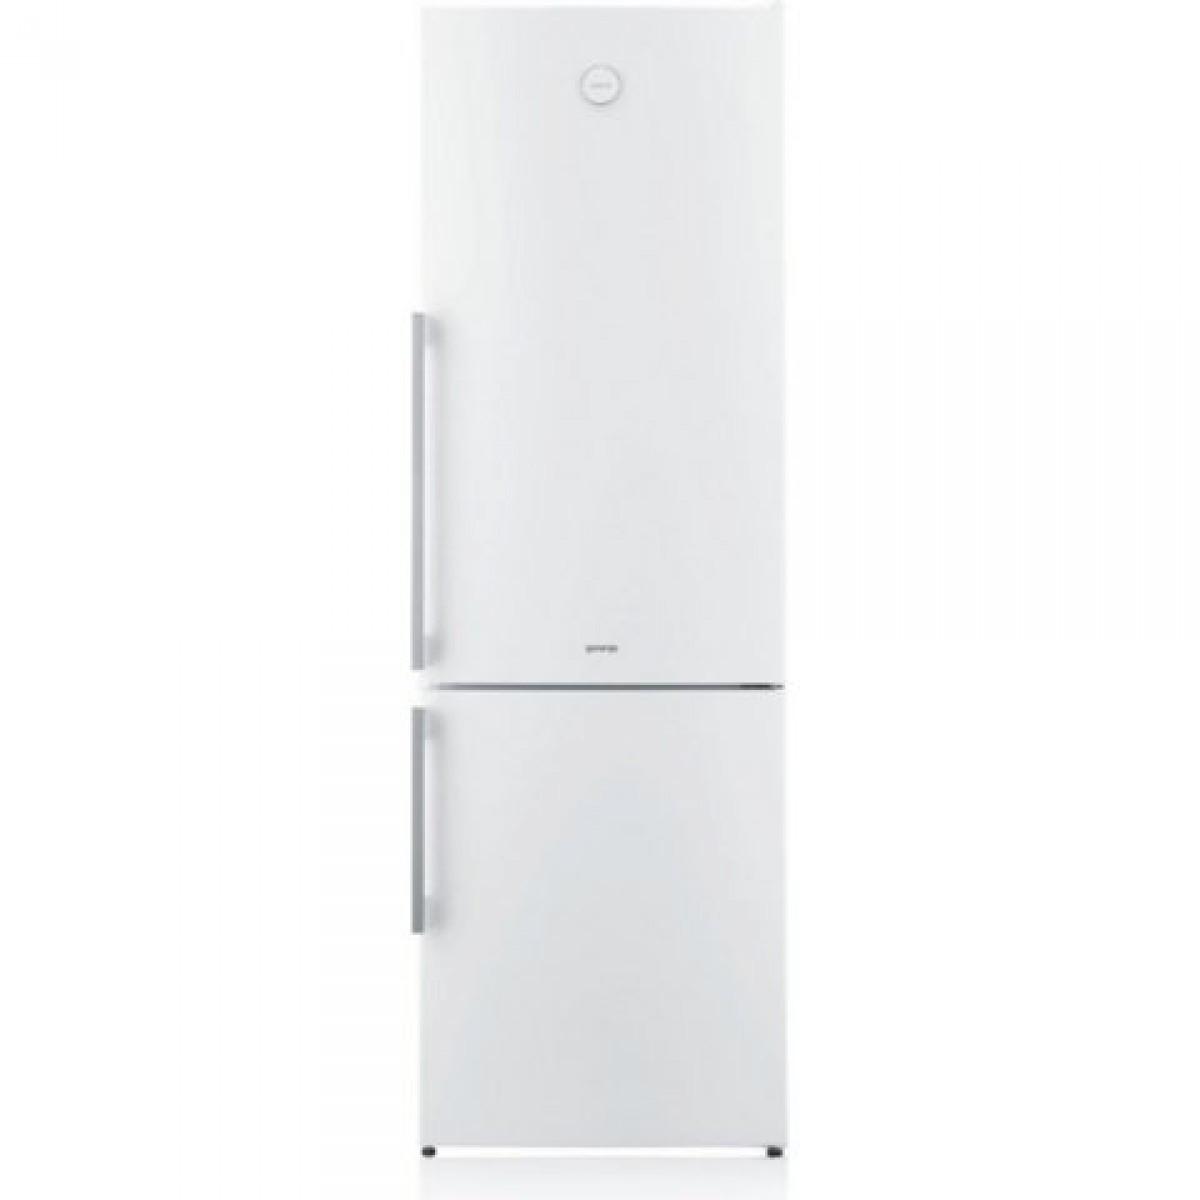 Двухкамерный холодильник Gorenje NRK62JSY2W